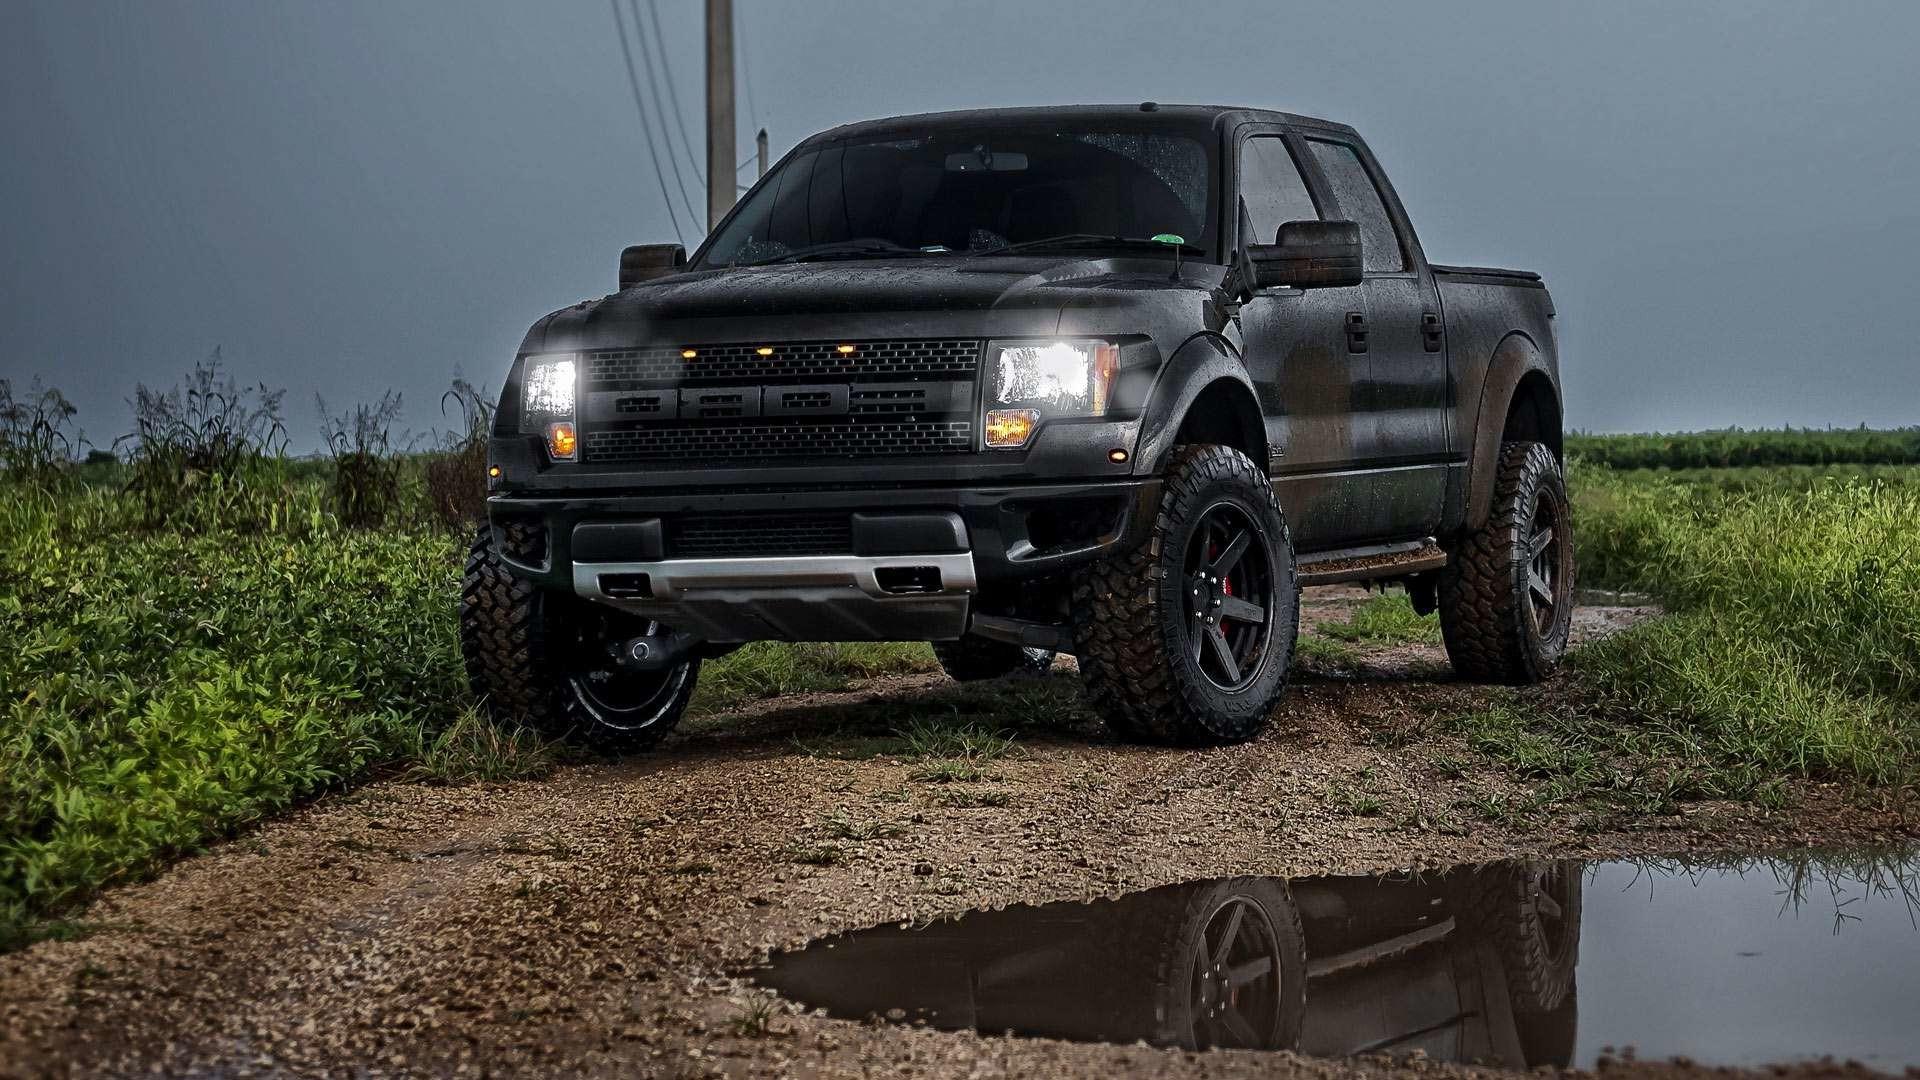 Ford Raptor Wallpaper Hd 74 Images